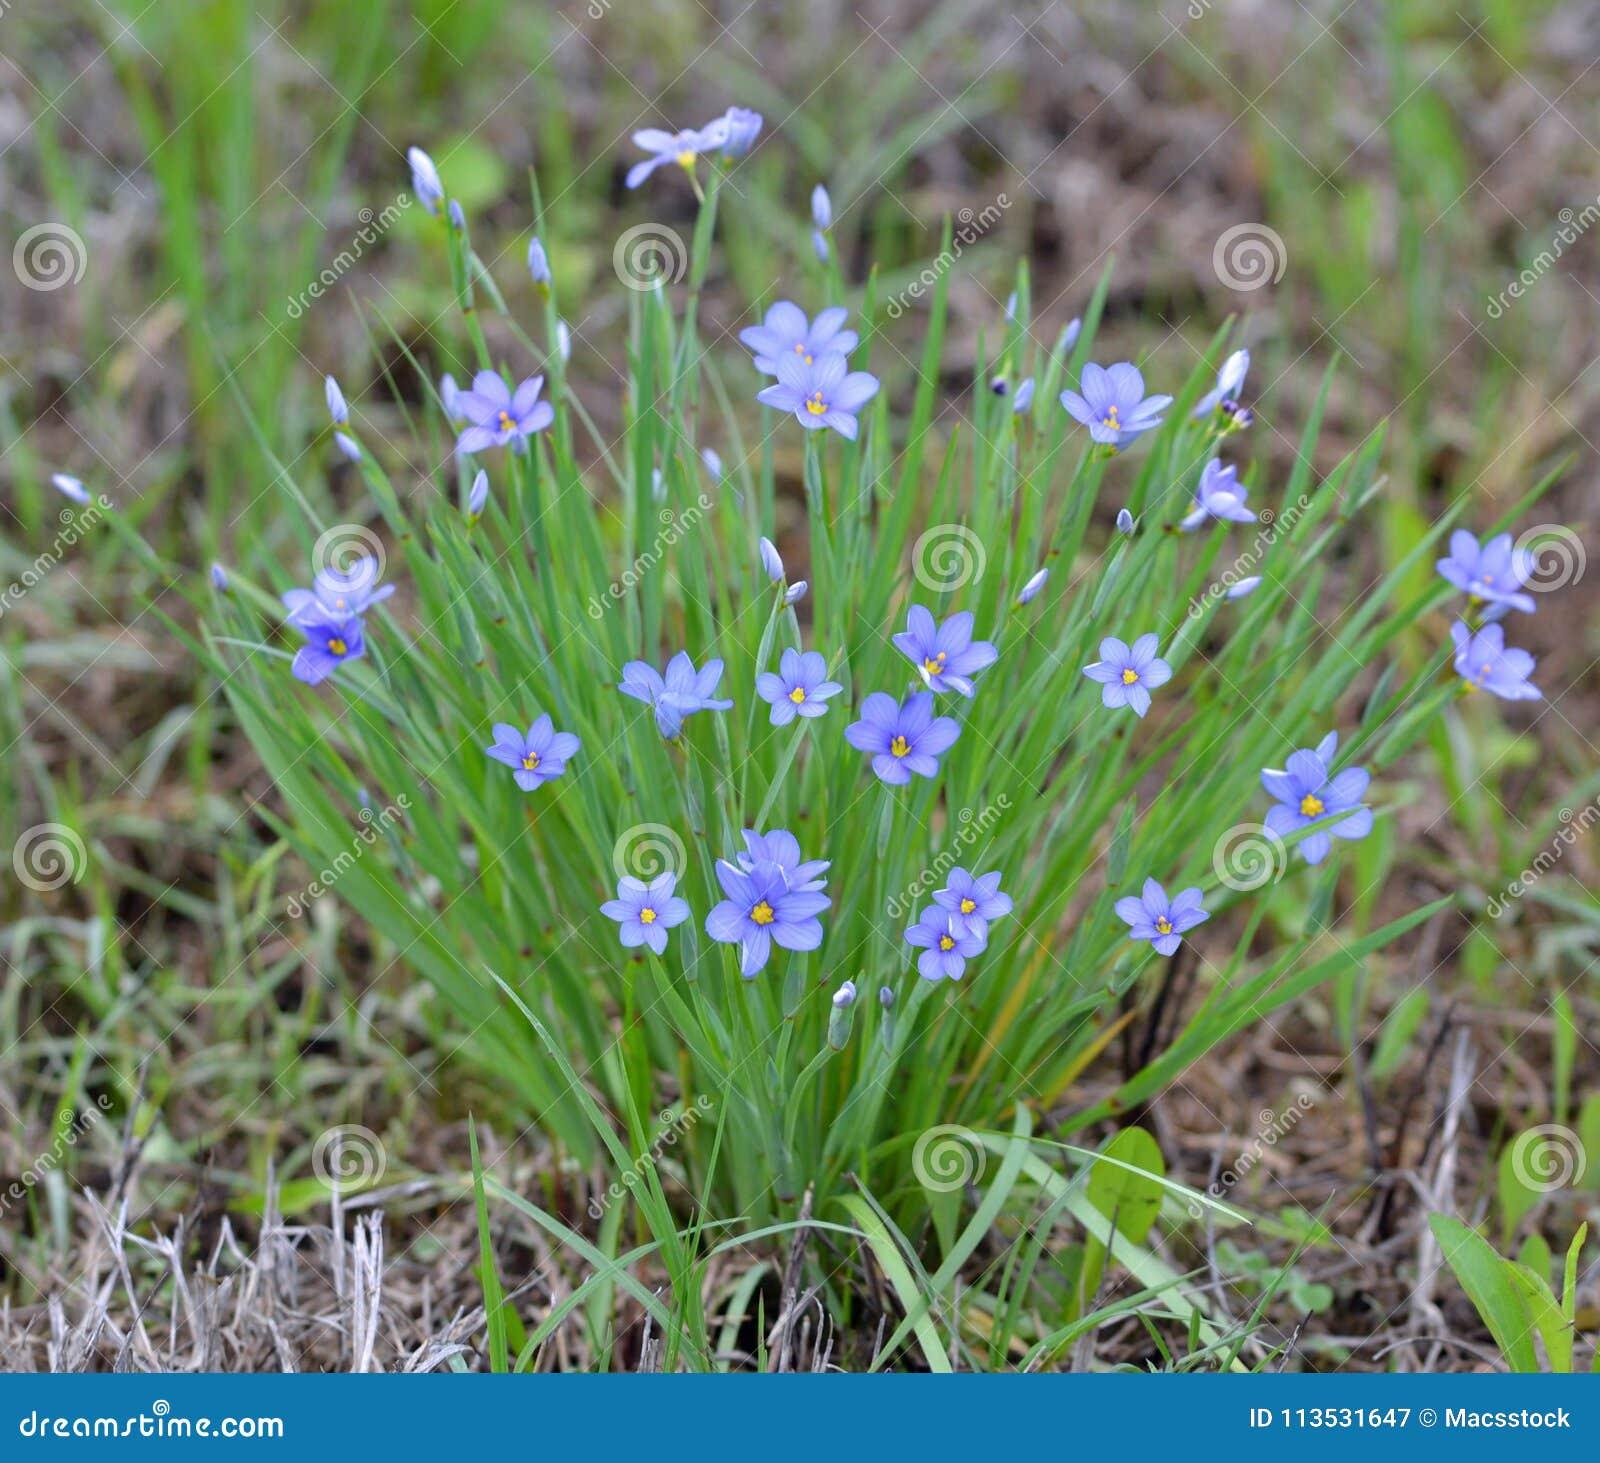 Azul típico flores e crescimento Eyed da grama